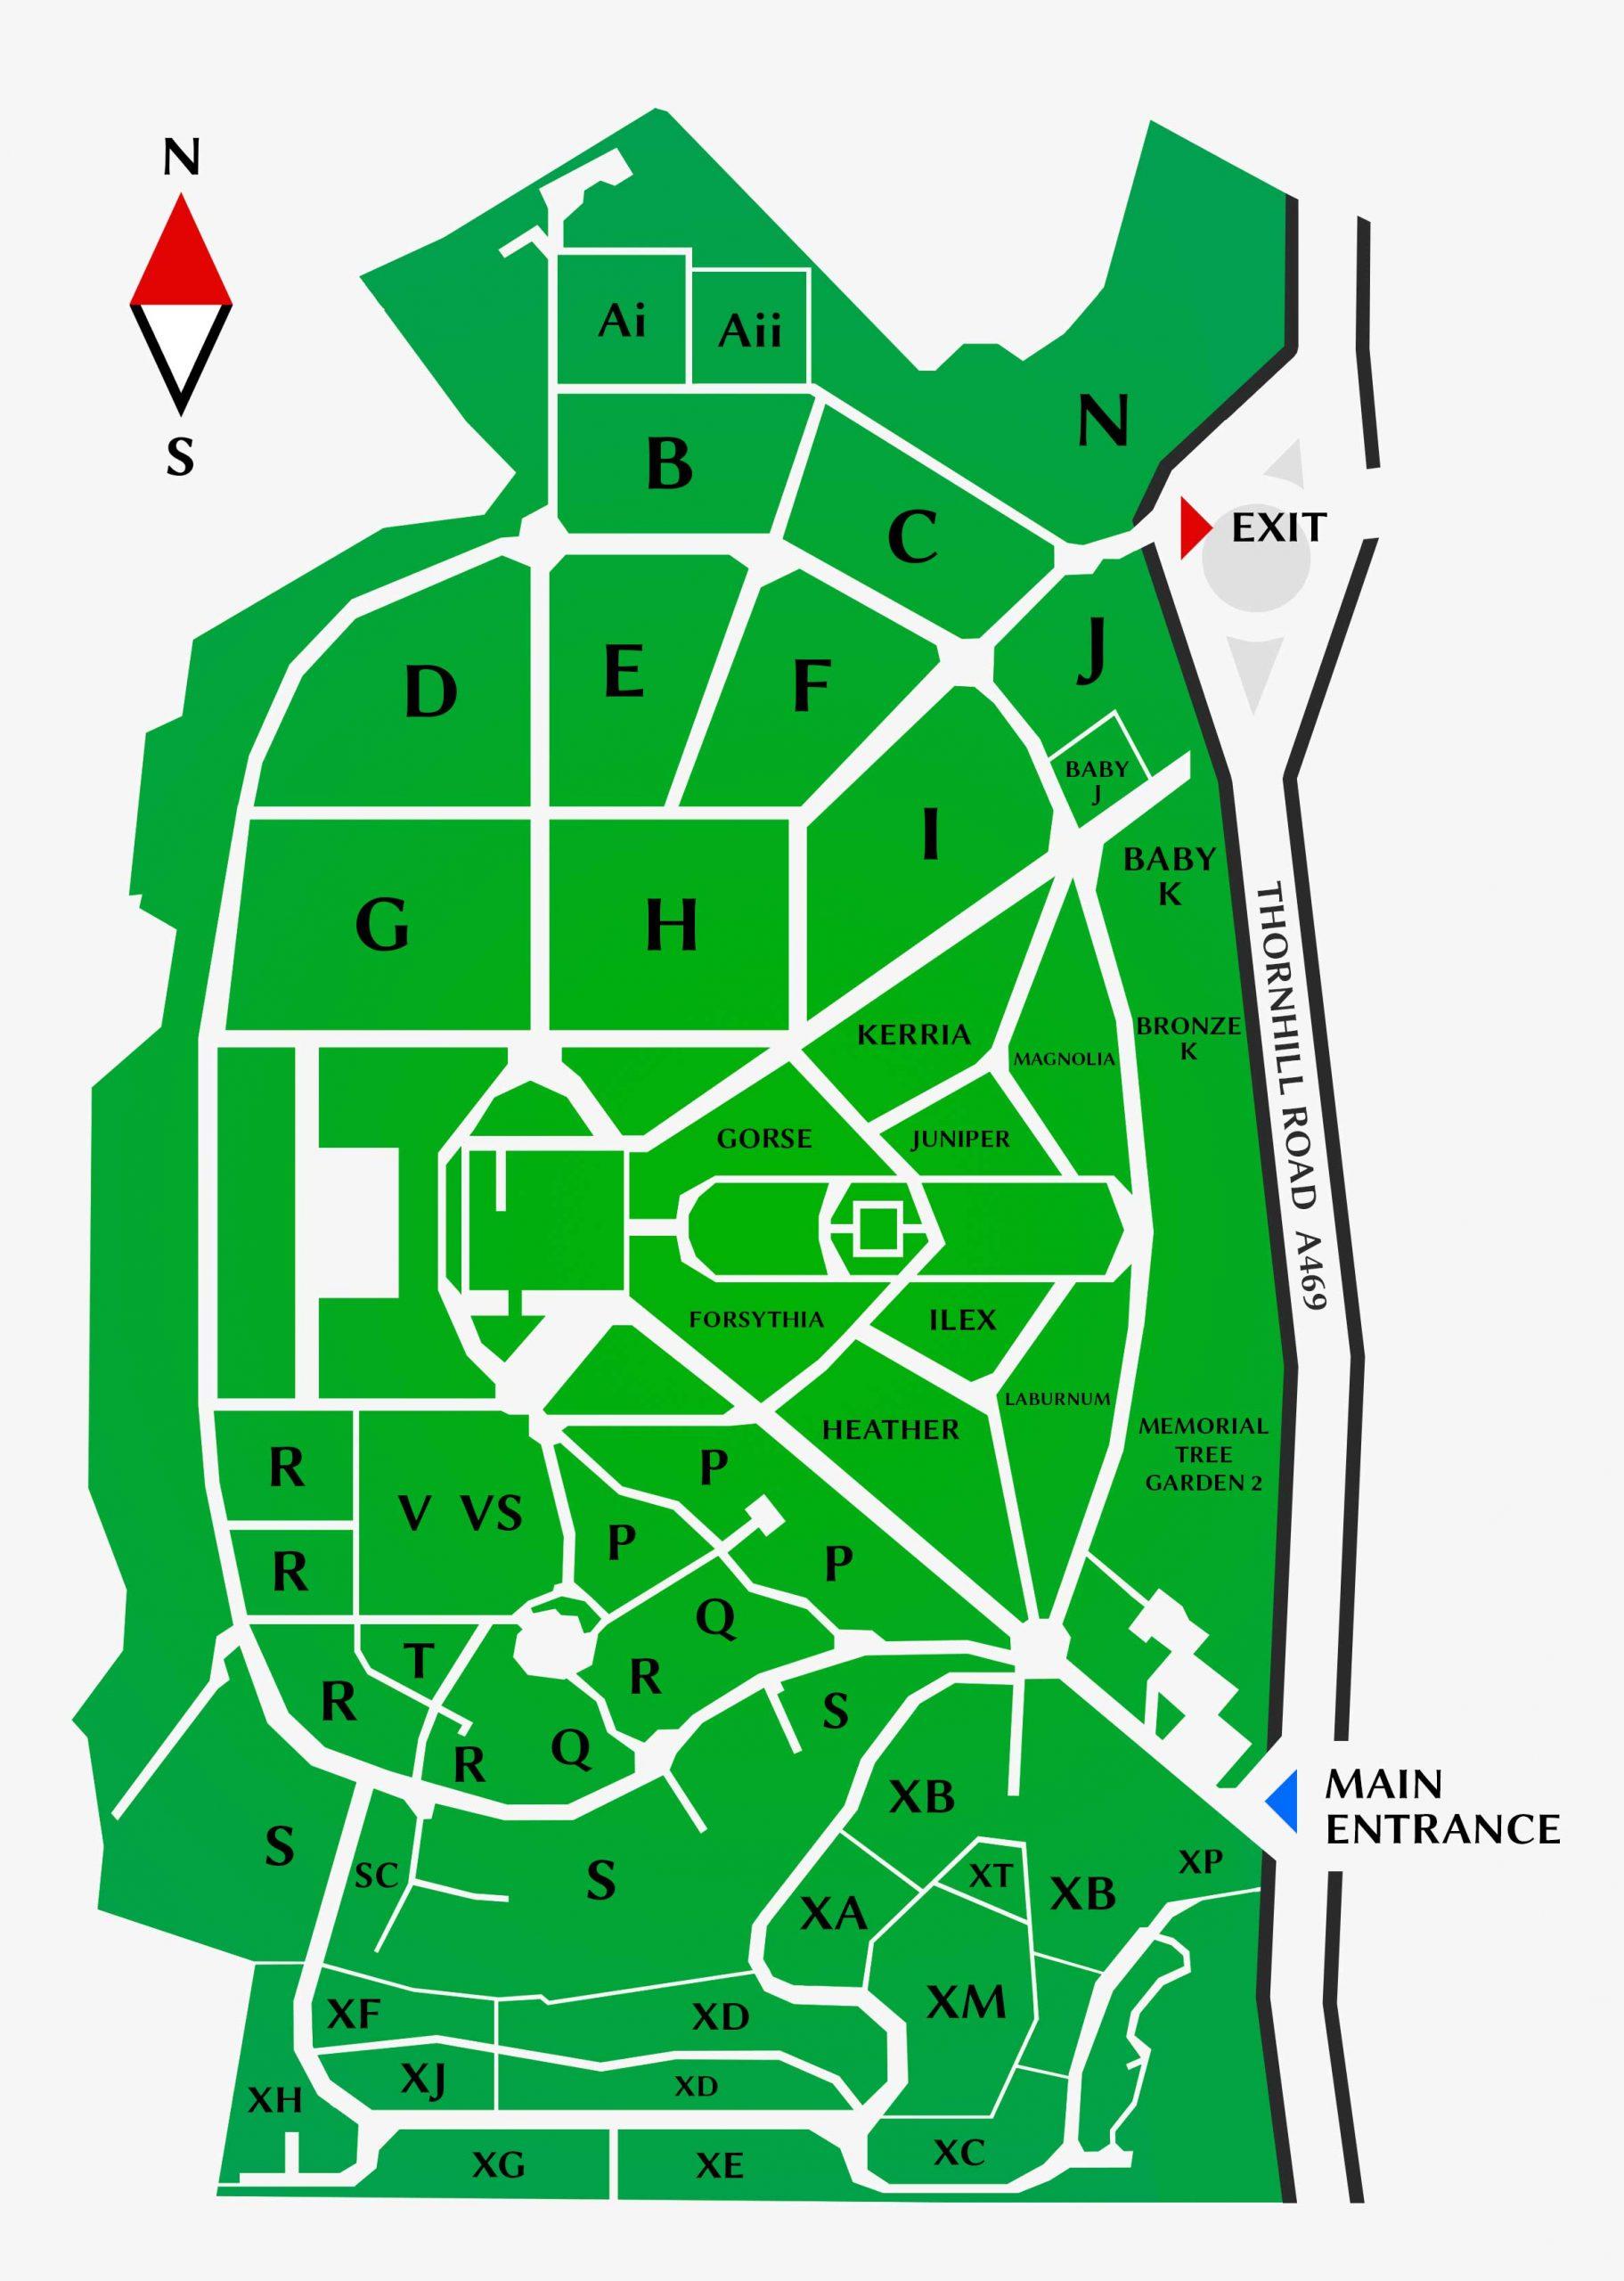 Thornhill Cemetery and Crematorium Map View Plan